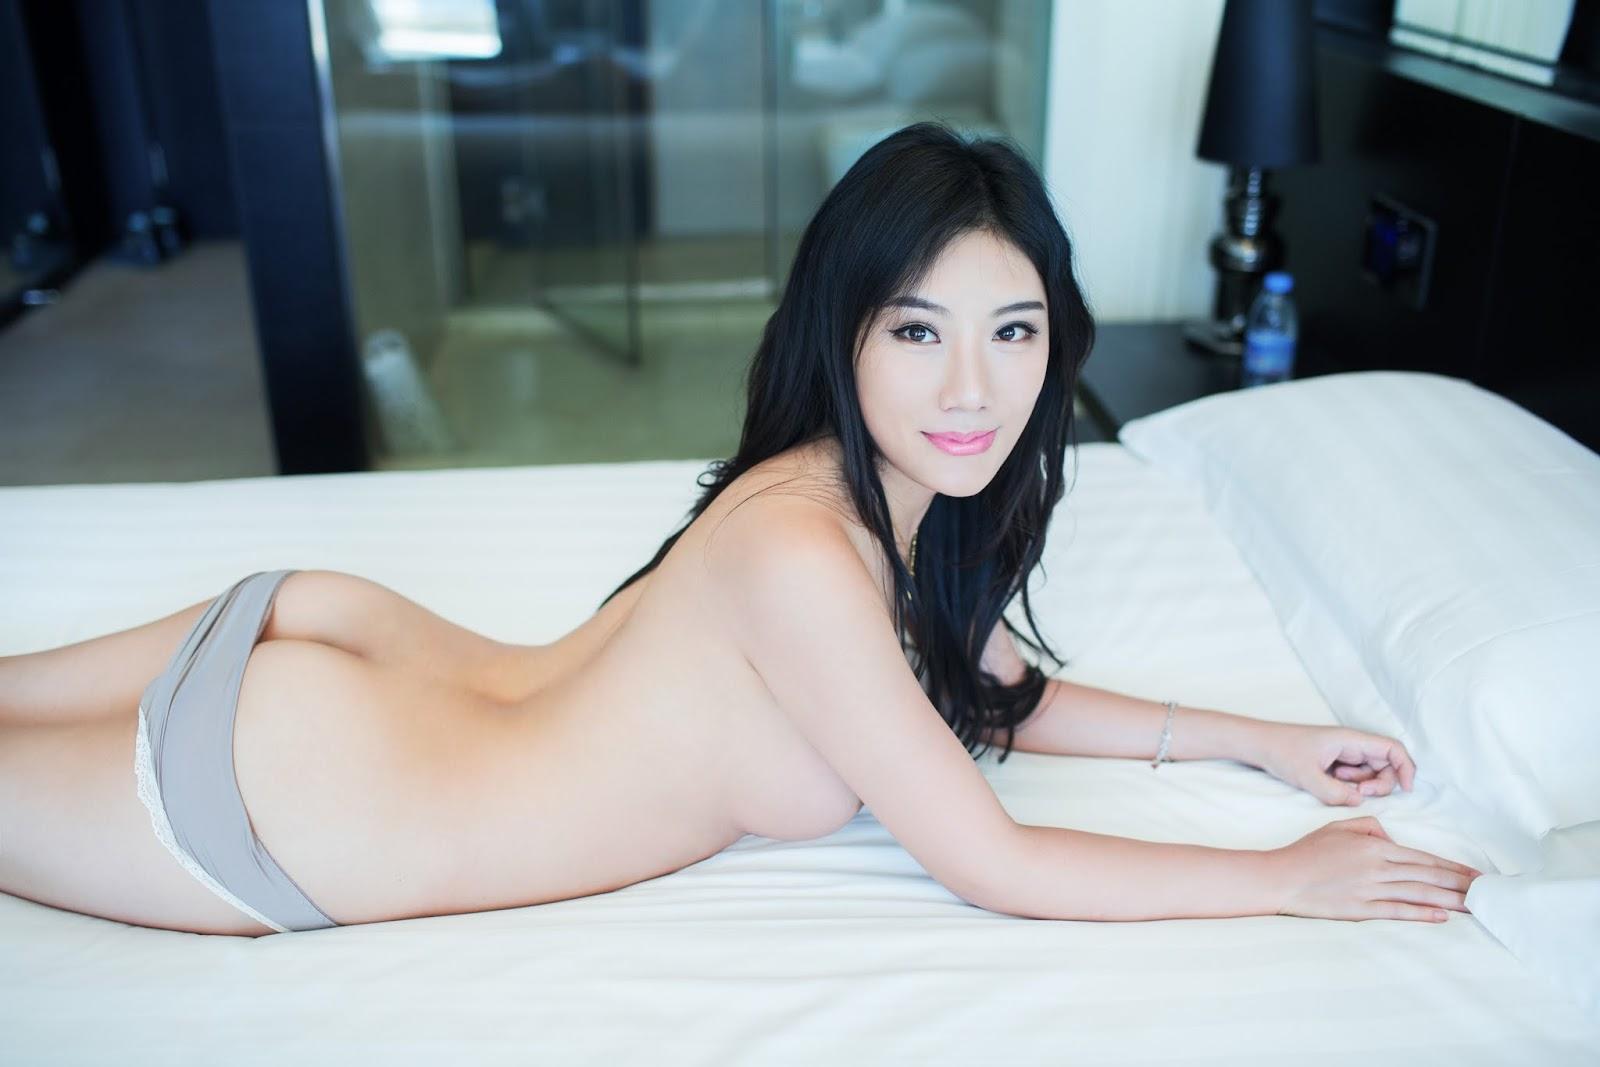 %25C2%25AC%252BO 07 - Hot Sexy Model TUIGIRL NO.46 Nude